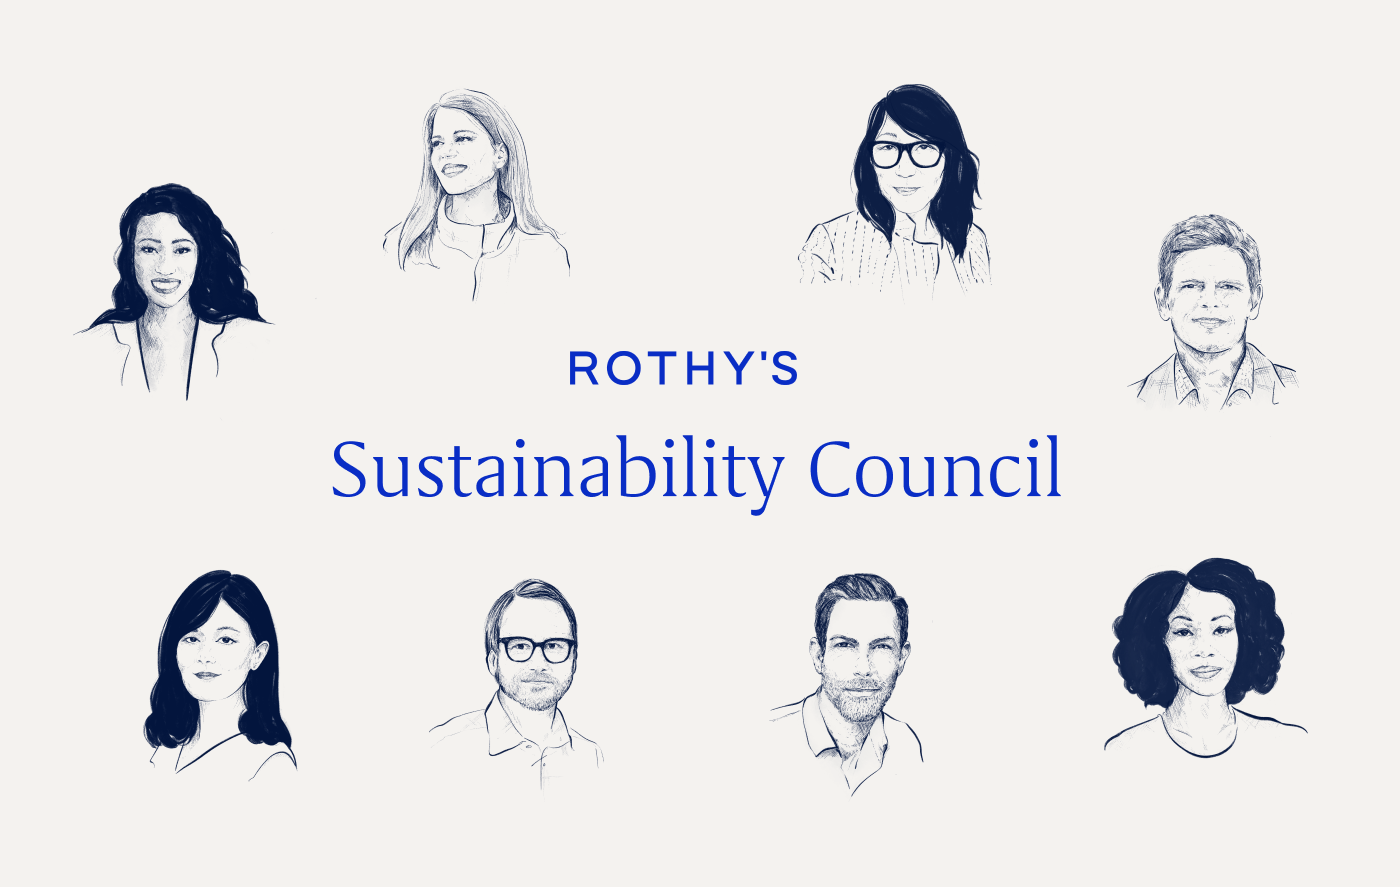 Sustainability, Rothy's, circular, fashion